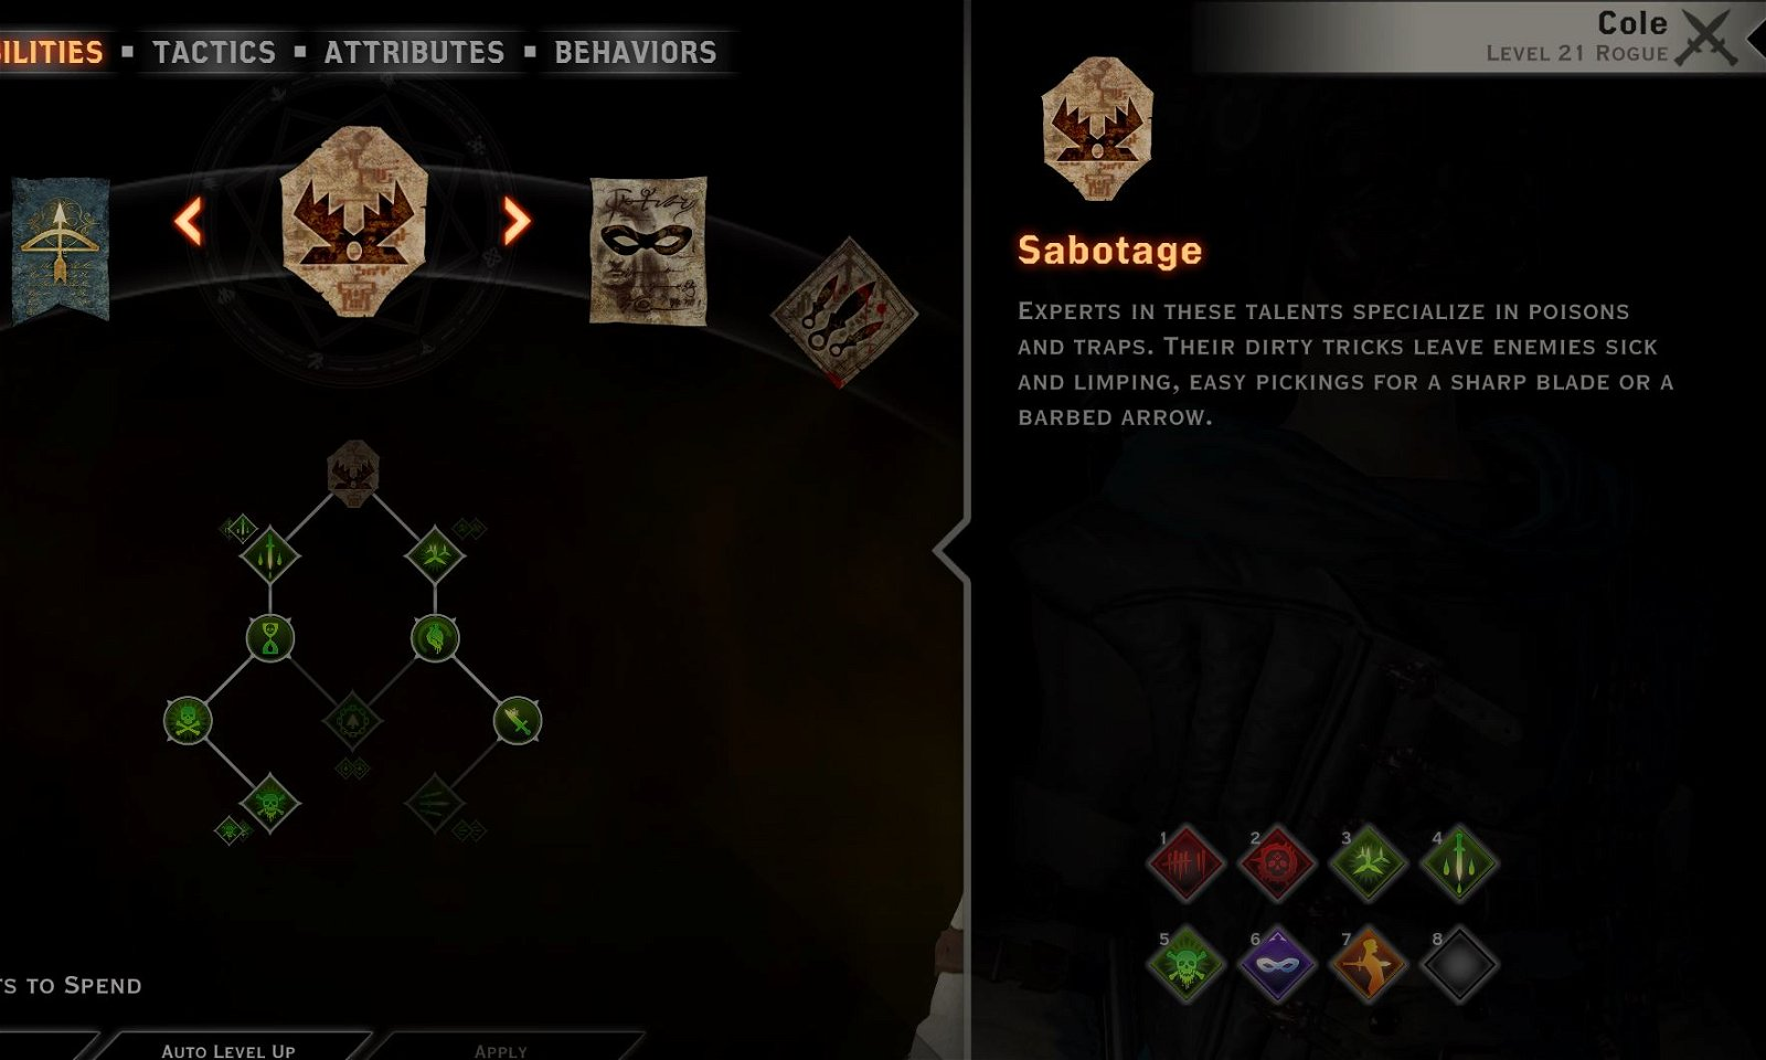 Cole dw build Sabotage tree